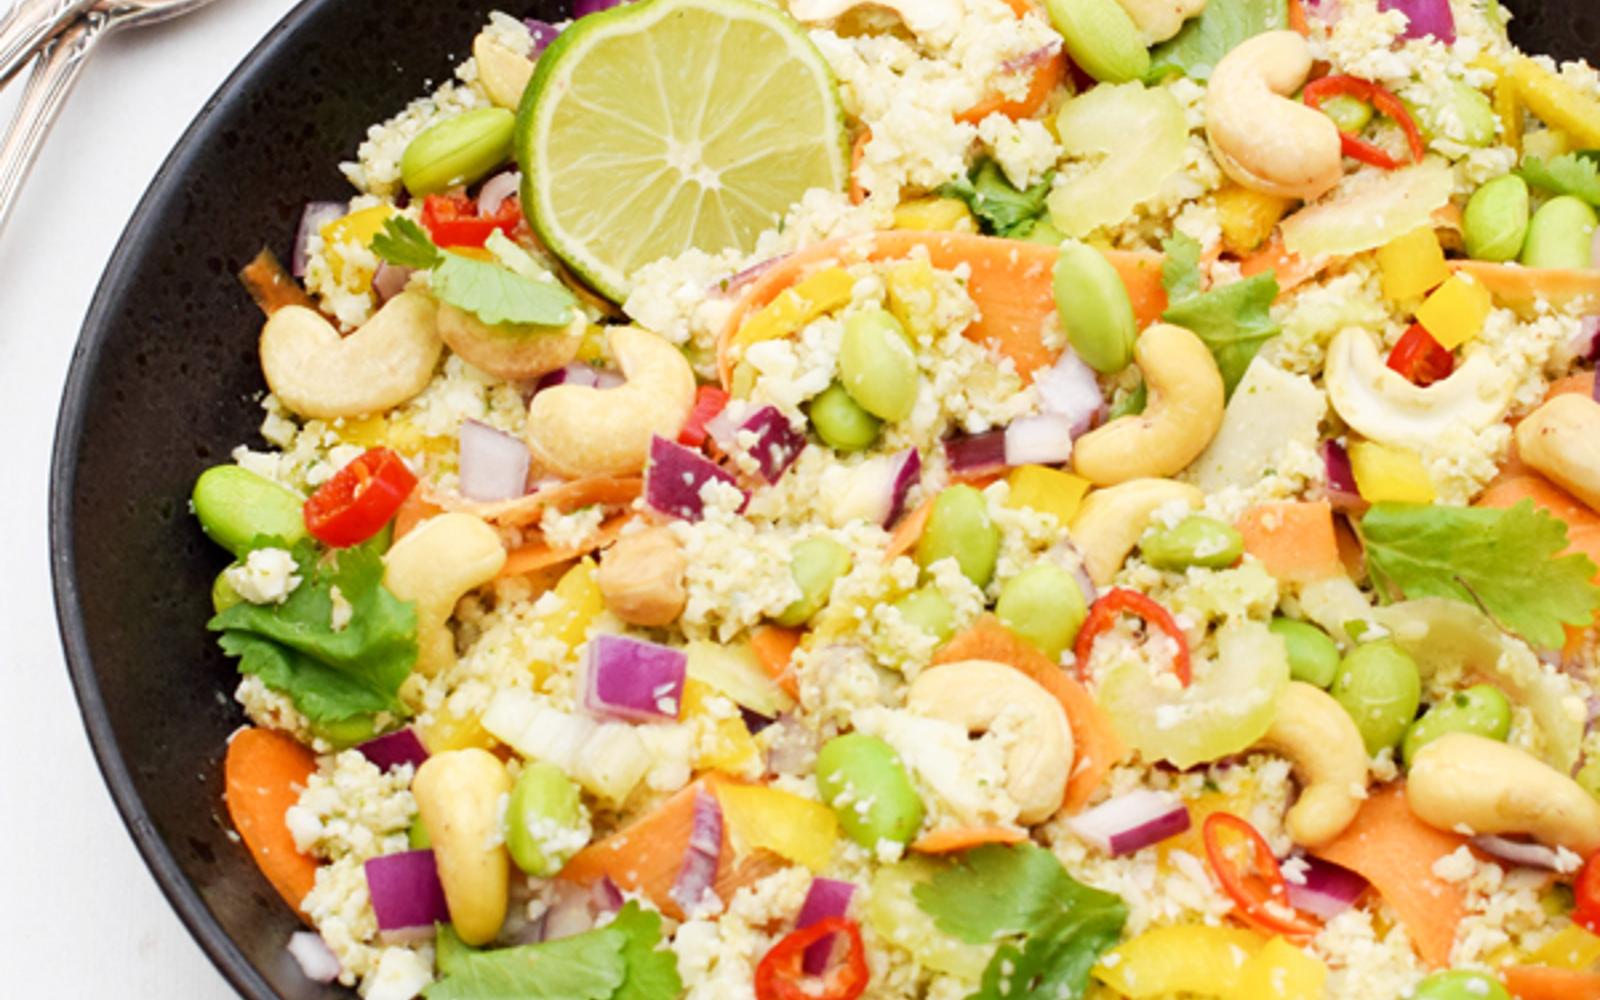 Crunchy Cashew Asian Cauliflower Rice Salad [Vegan, Gluten-Free]